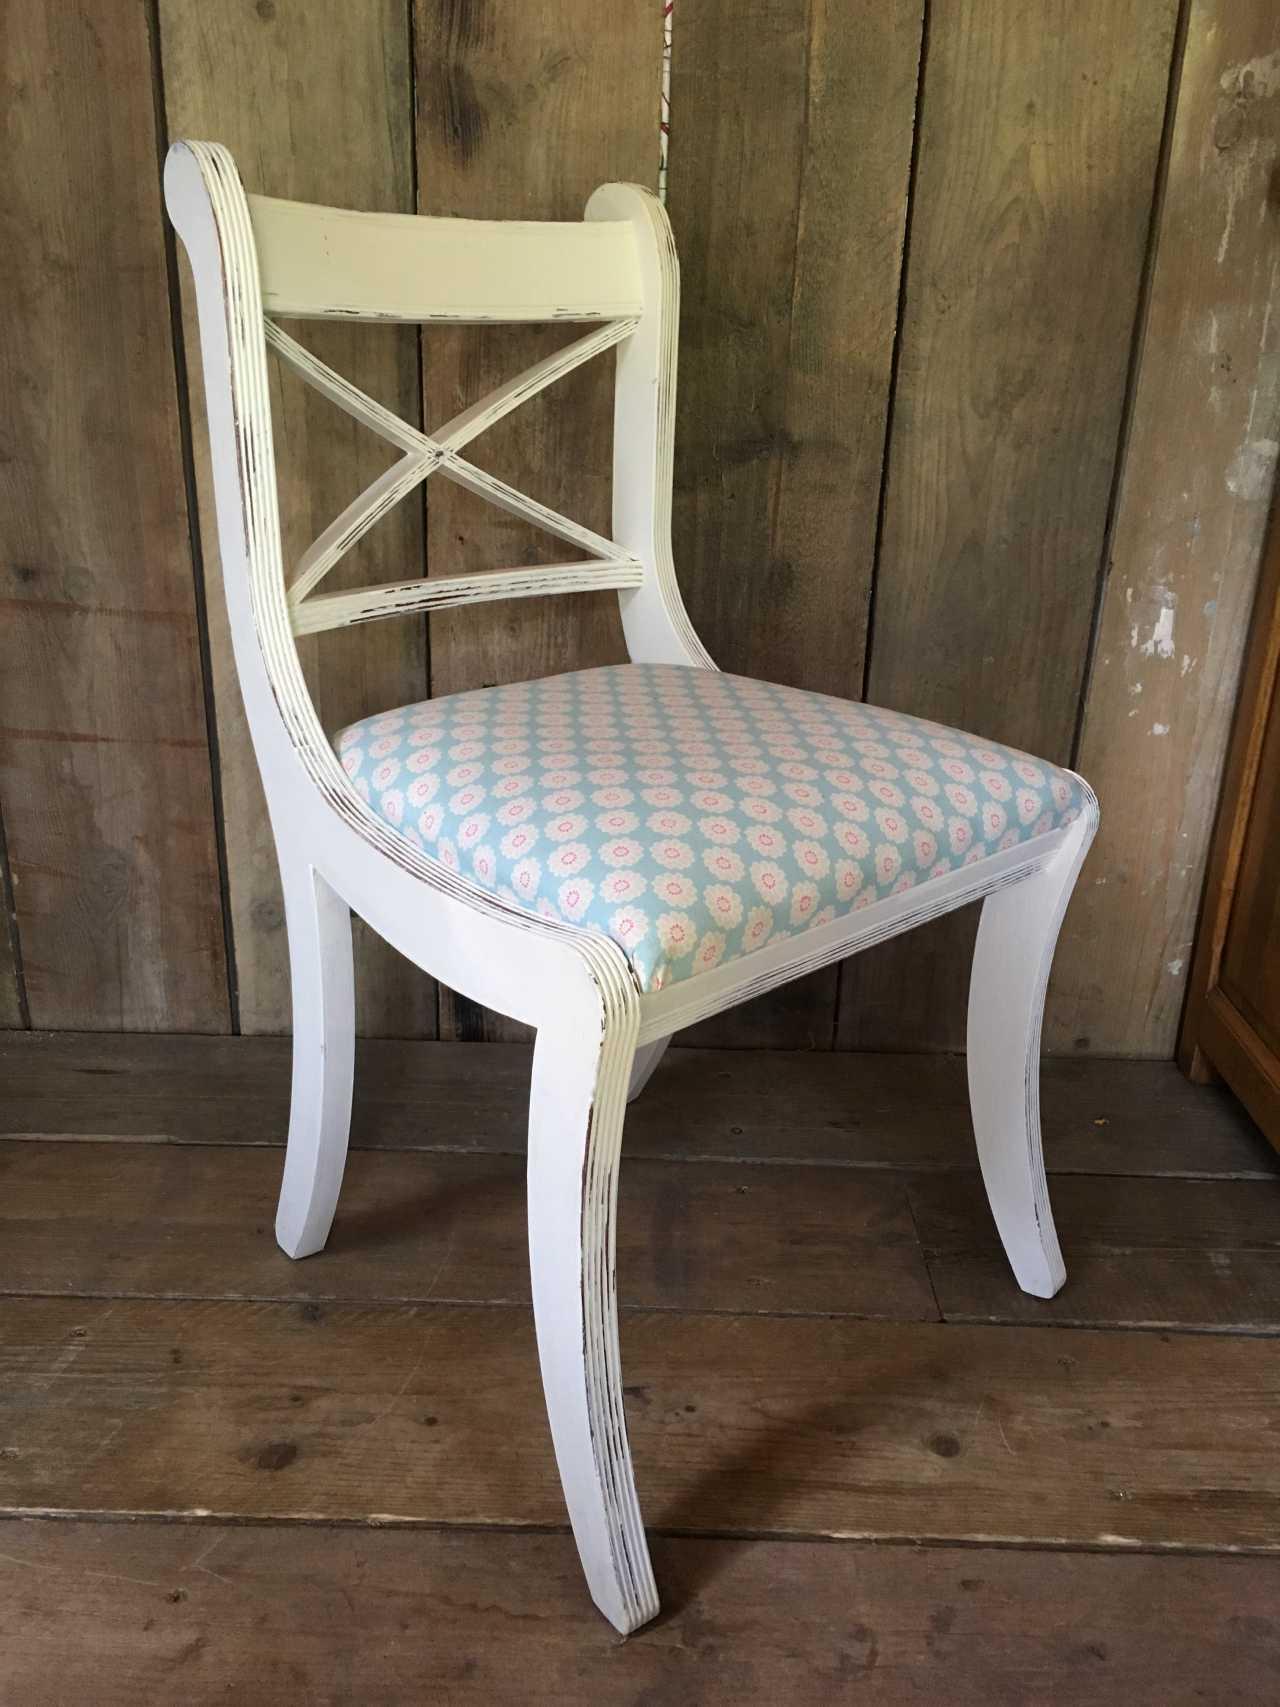 White Painted Shabby Chic Chair Shabby Chic Chairs Chair Shabby Chic